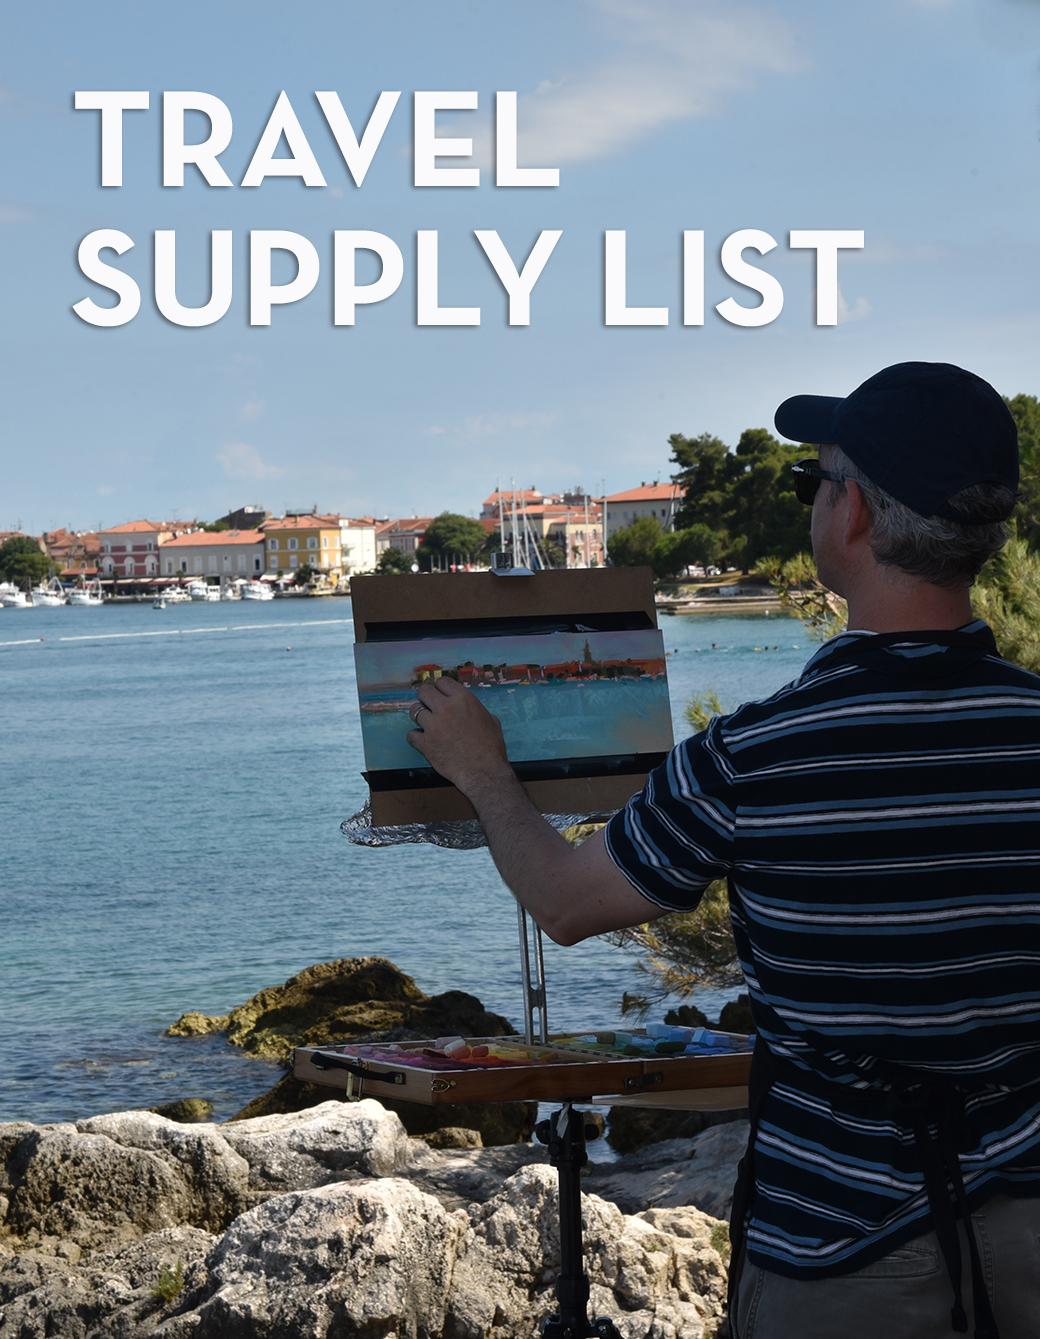 Travel supply list.jpg